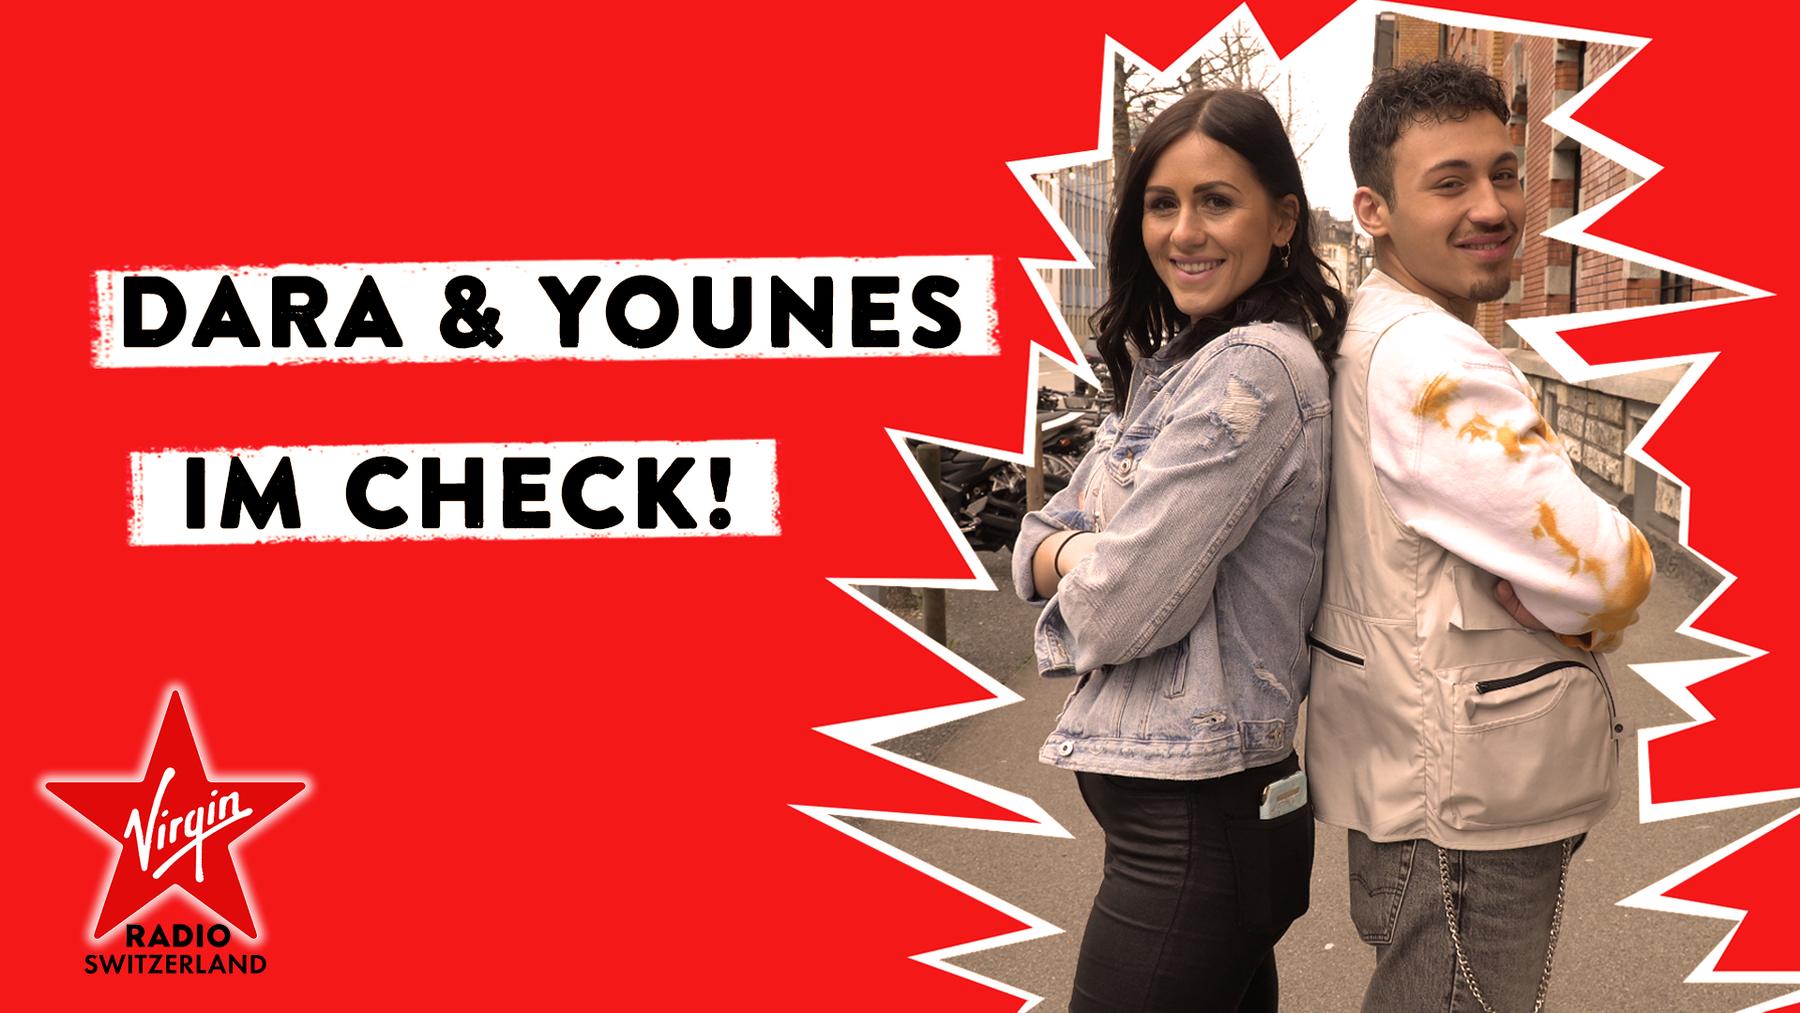 Dara & Younes im Check